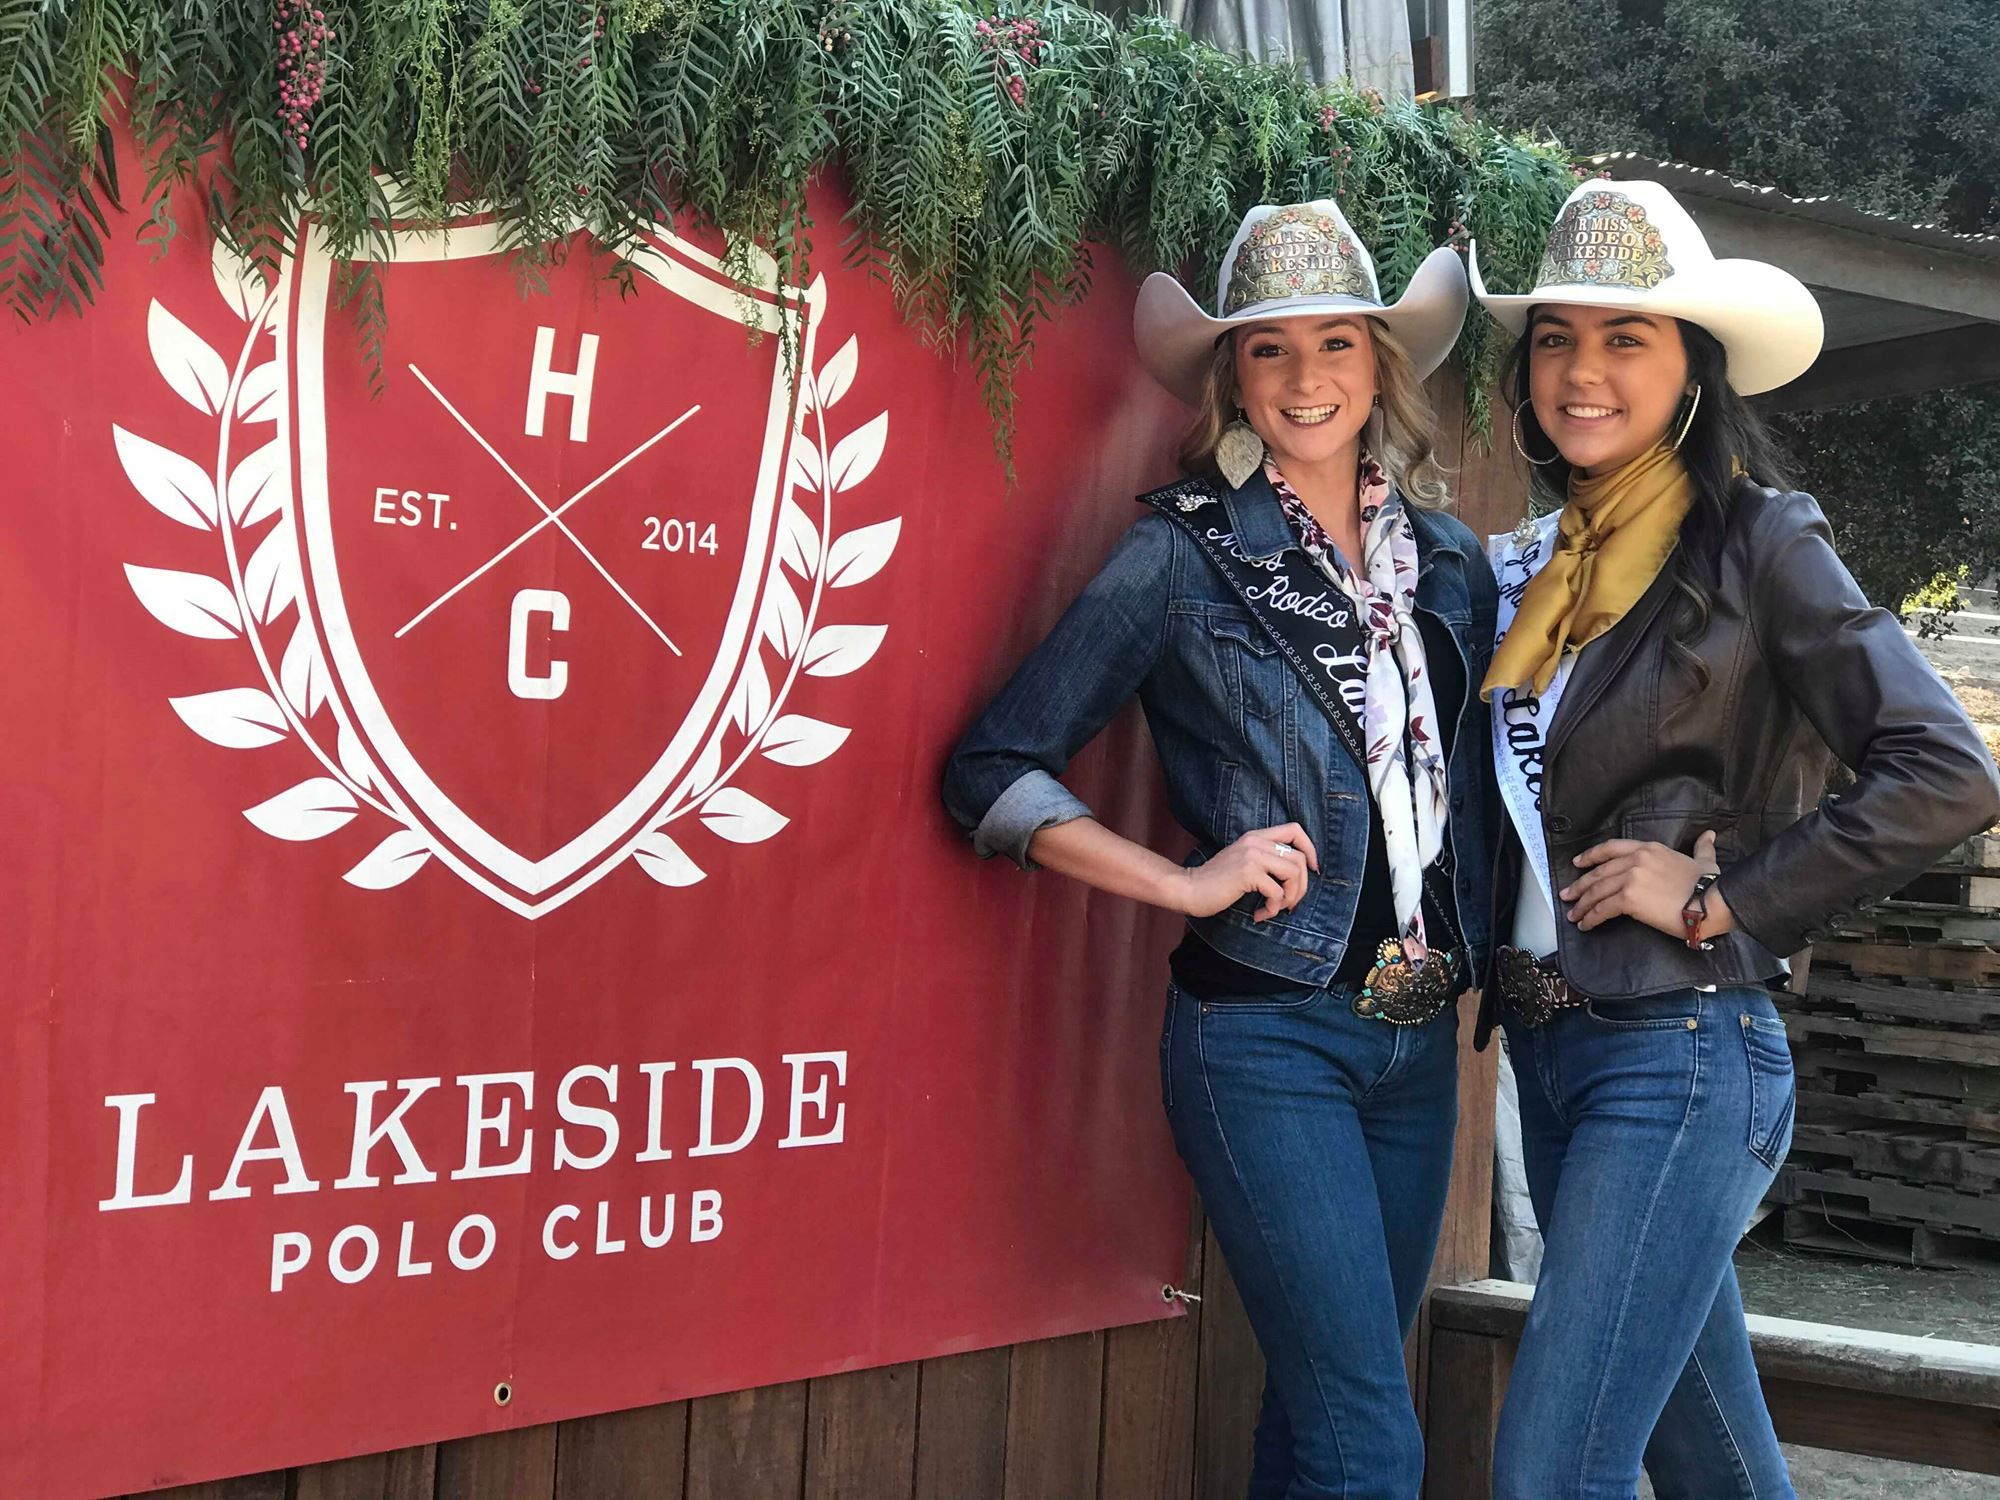 Lakeside Polo Club